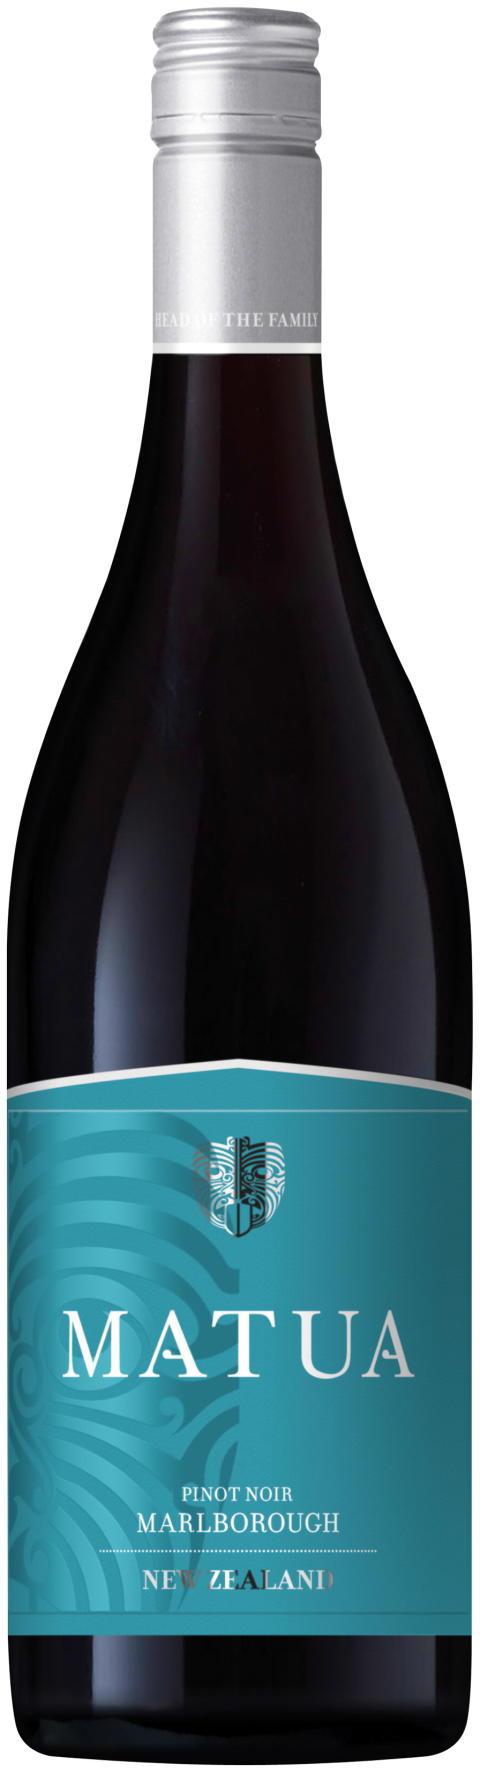 Matua Marlborough Pinot Noir 2014